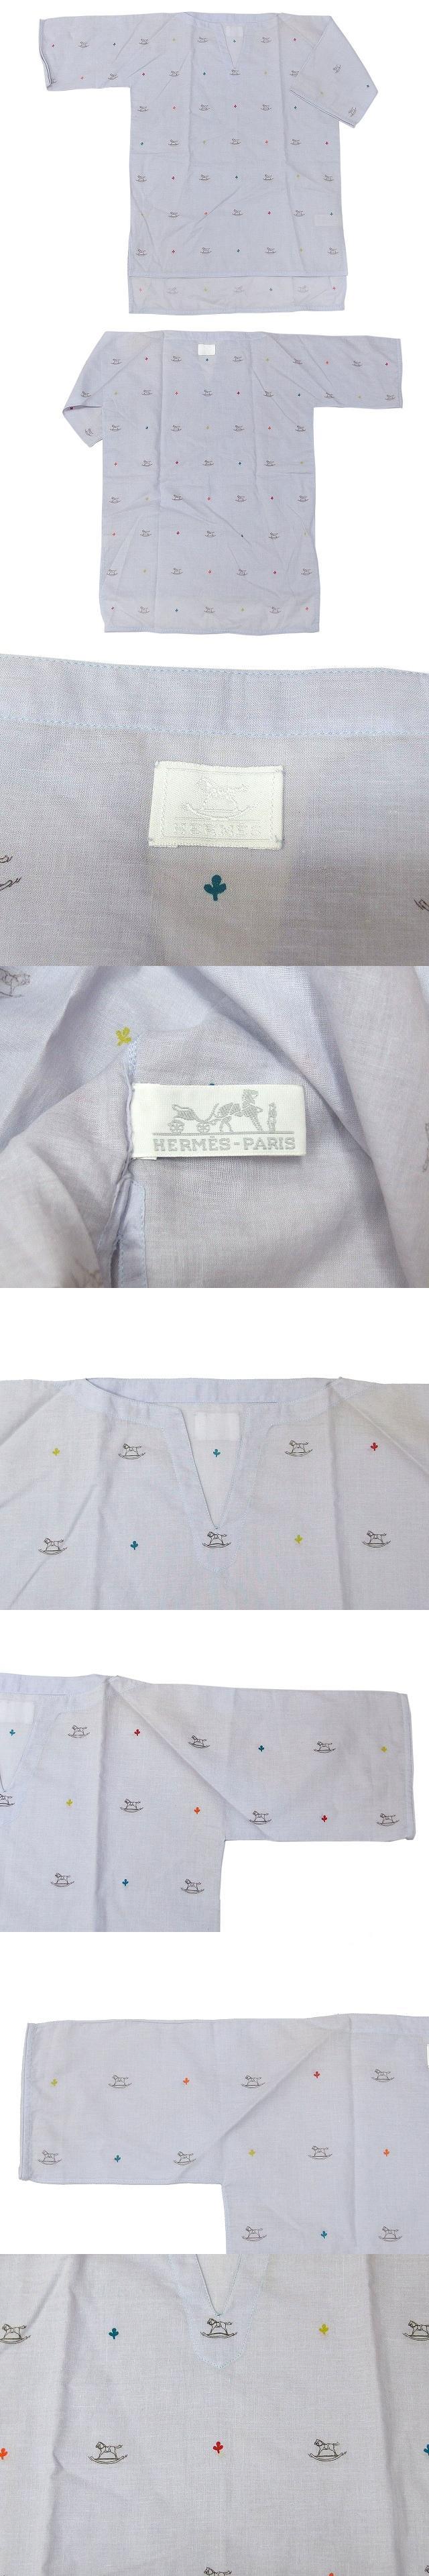 dcb75a1ab5f7a 代購代標第一品牌- 樂淘letao - エルメスHERMES 子供服ベビー服肌着長 ...